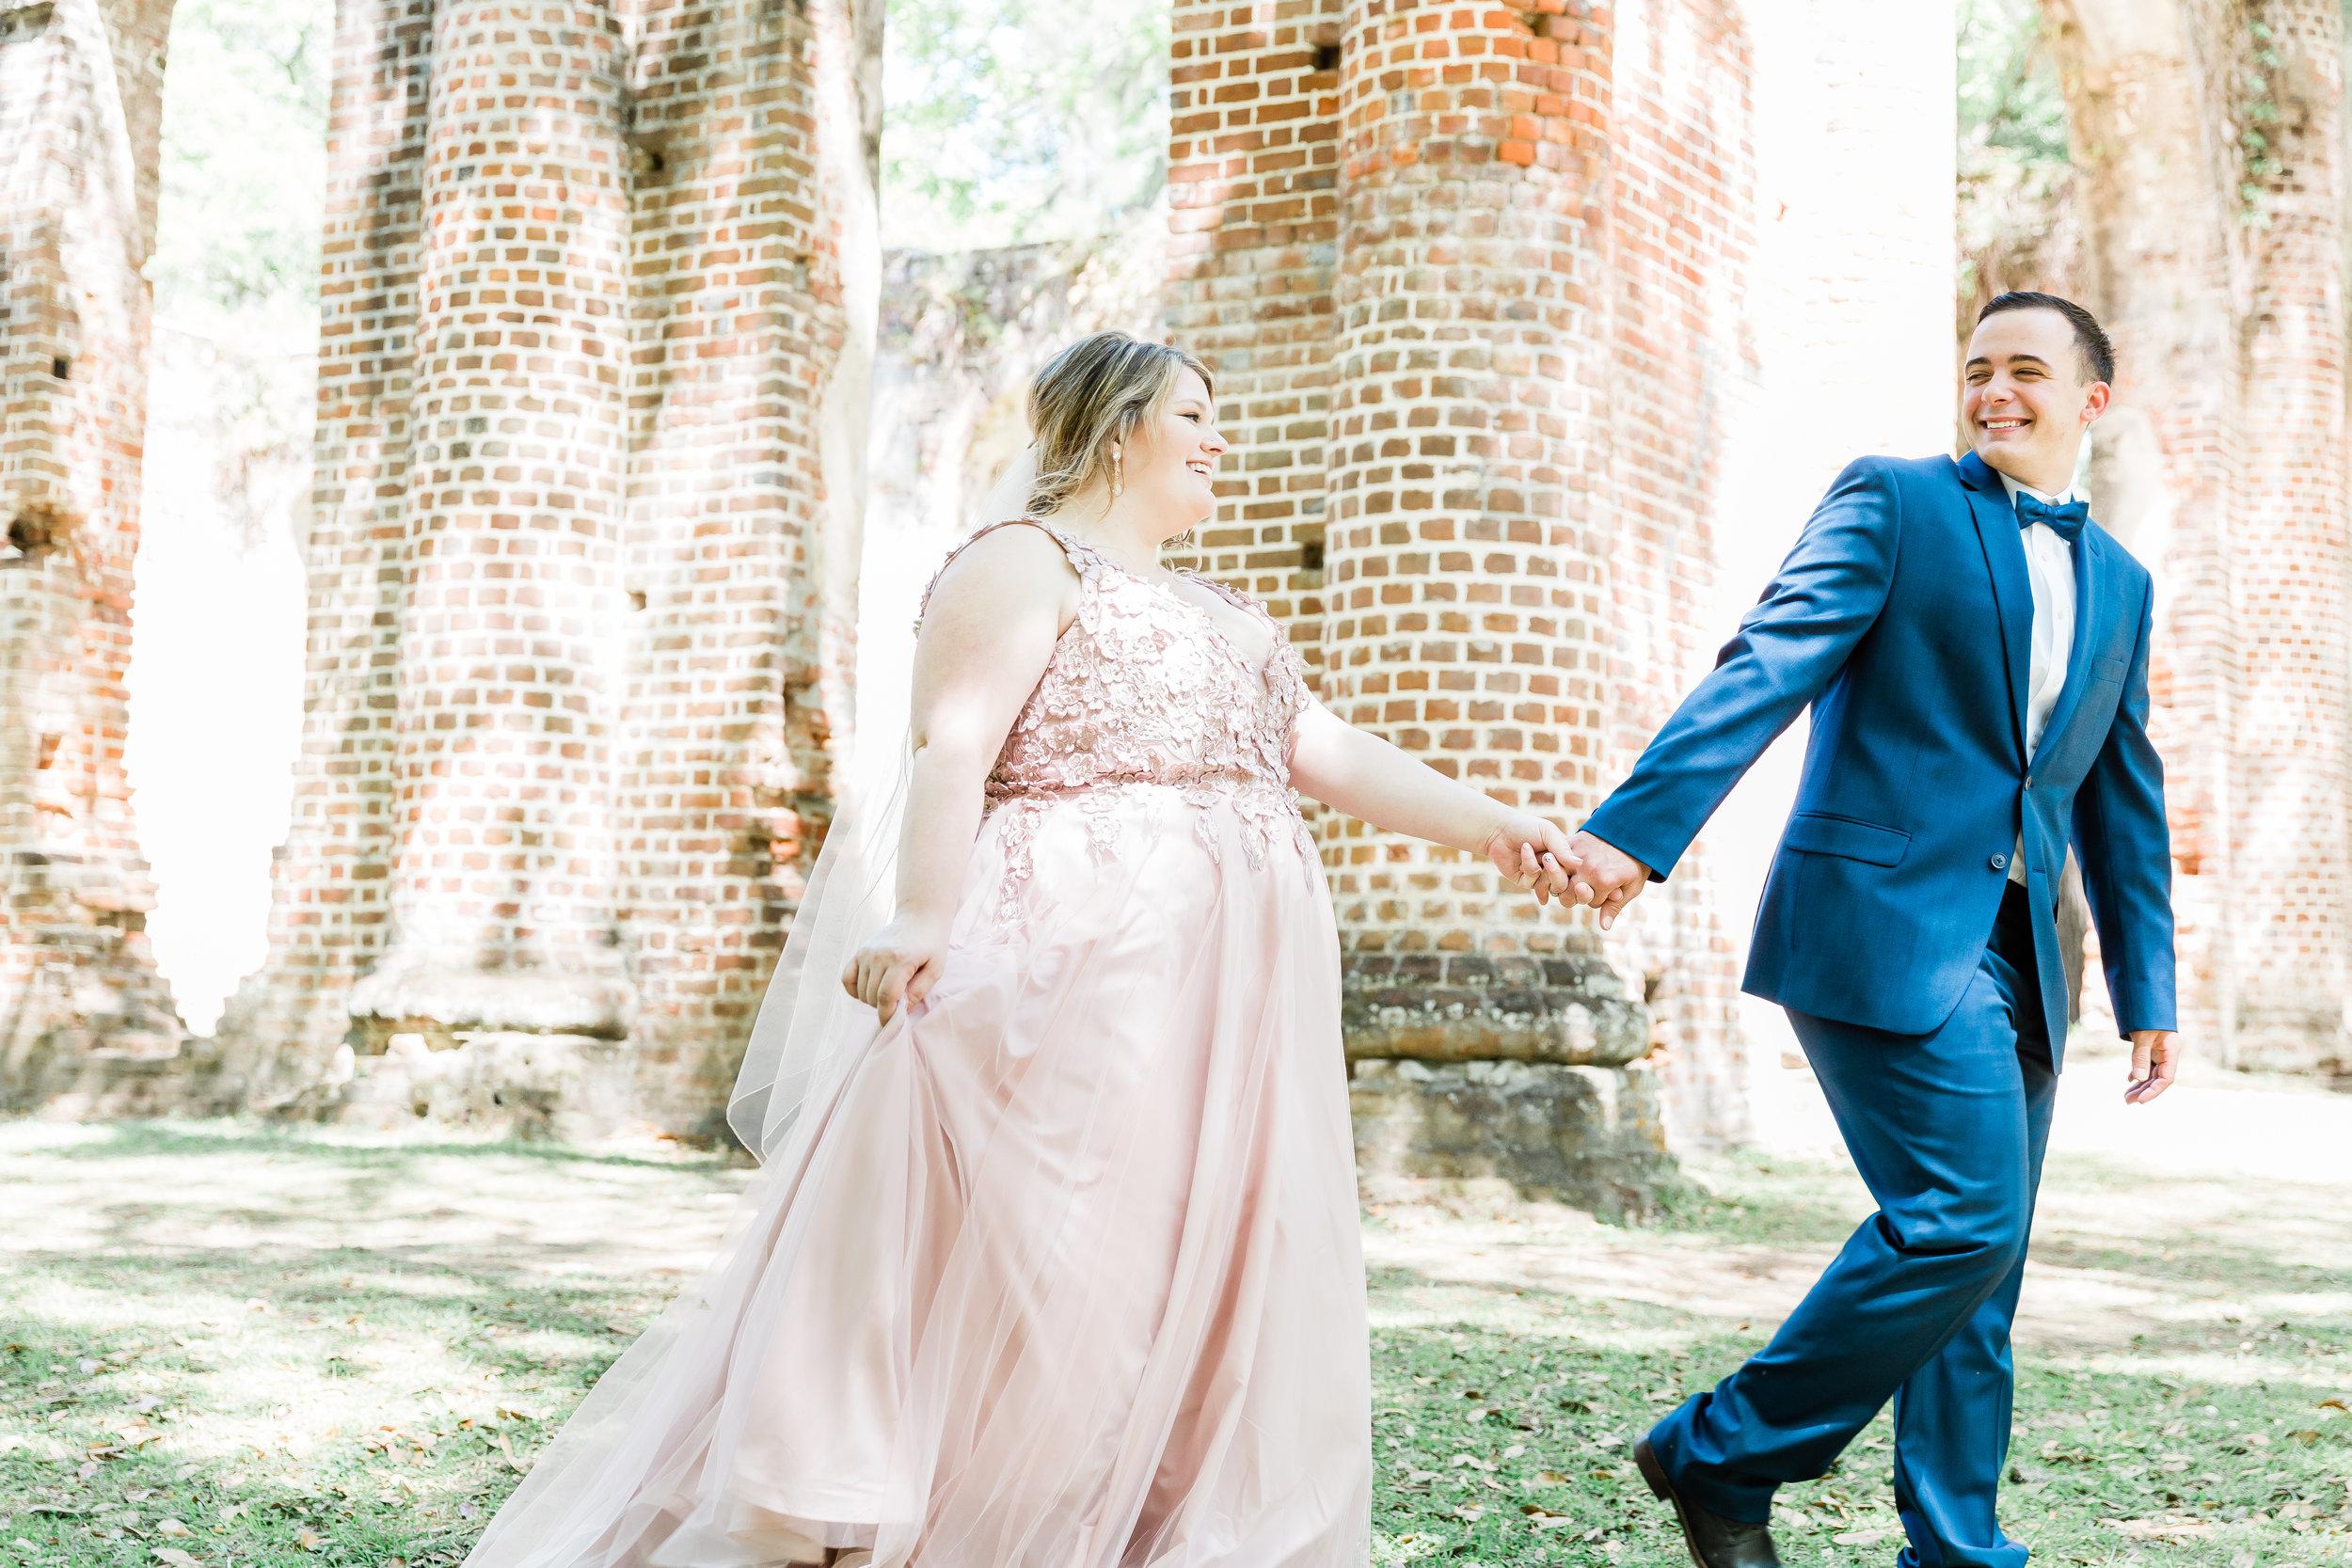 20190417-Southern Lens Photography-savannah family photographer- Ashley and Zack-old sheldon church ruins-201949.jpg